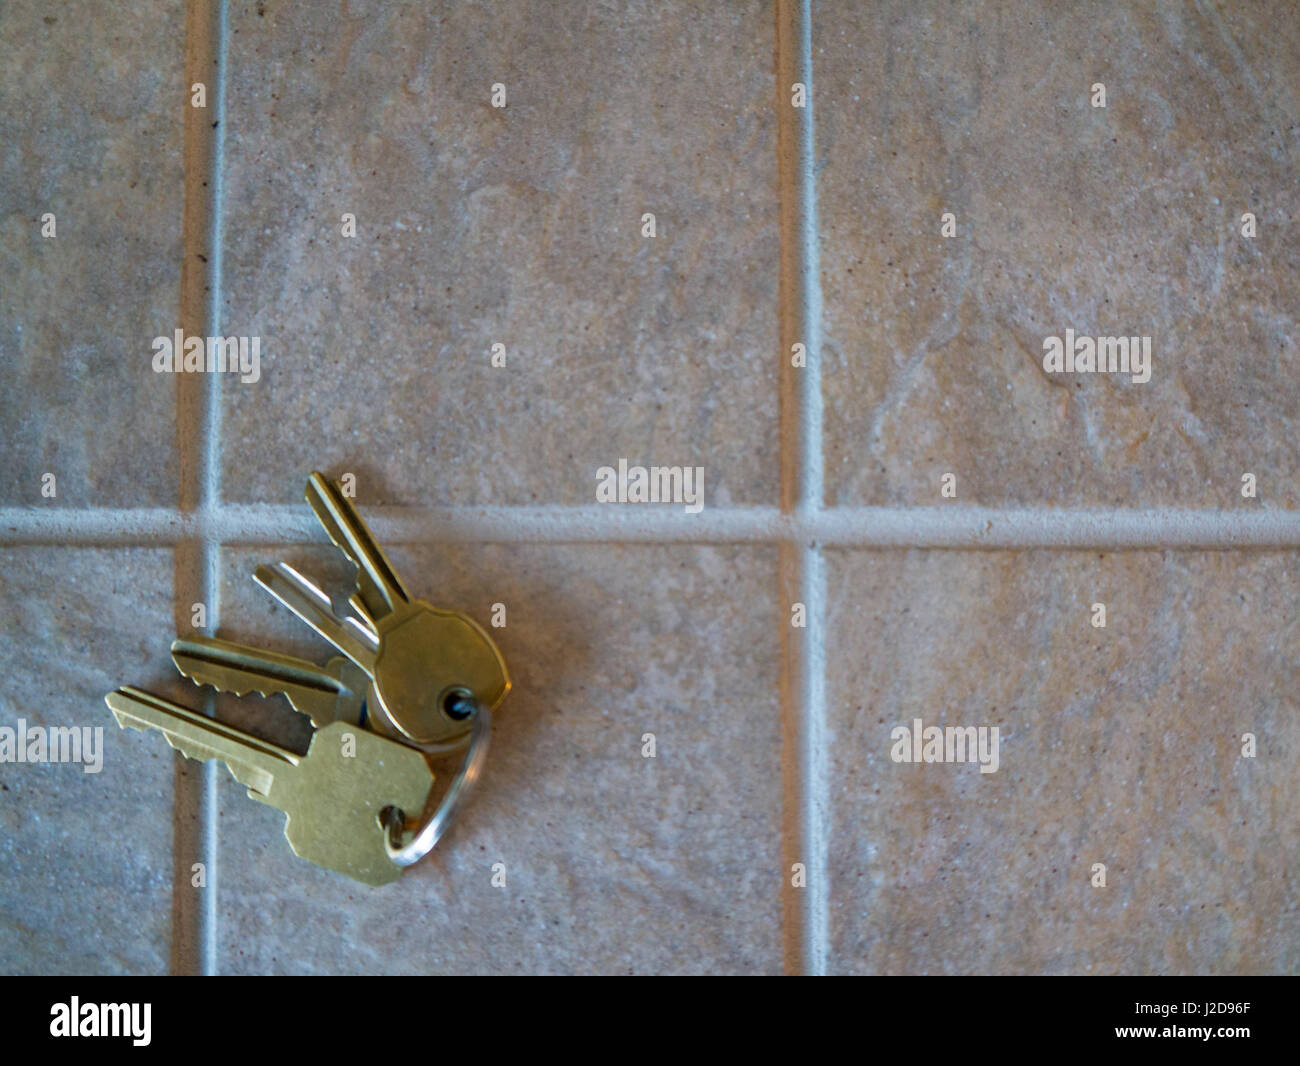 ceramic tiles, keys, sanded grout land, scape orientation - Stock Image